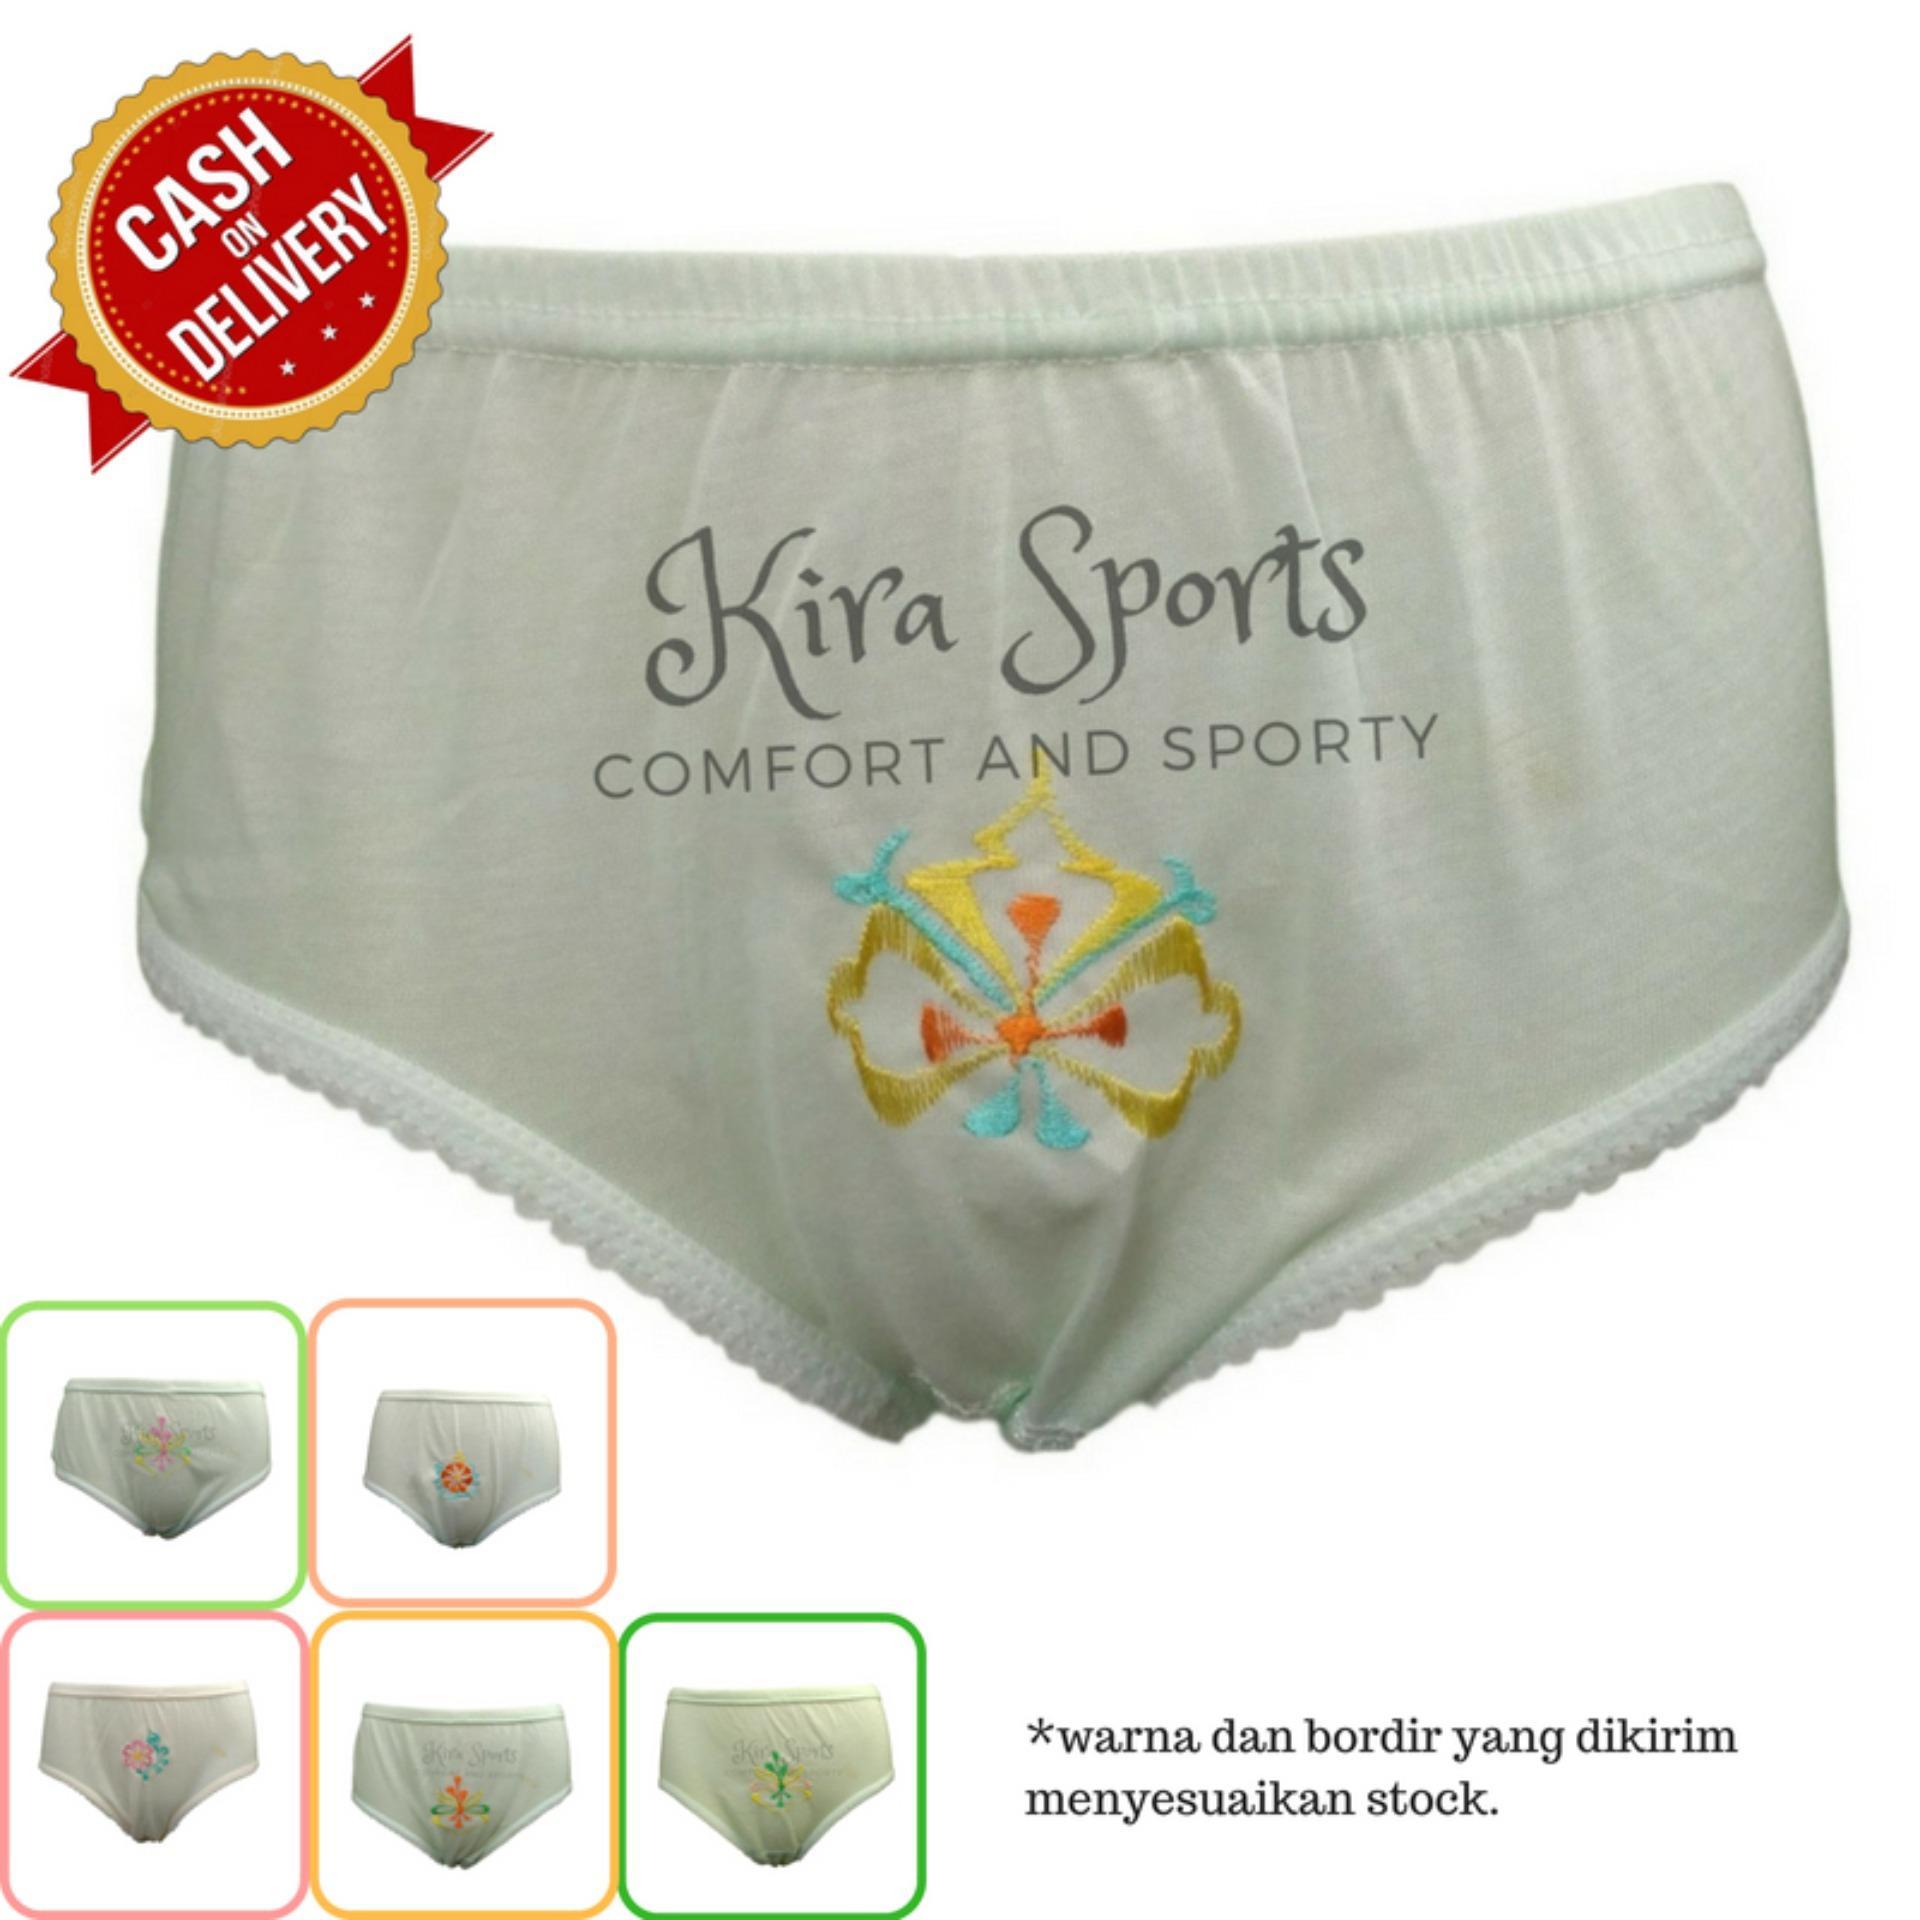 Harga Celana Dalam Terbaru November 2018 Discount Smartphone Cd Wanita Renda Kira Sports Sexy Bukan Merk Sorex Jumbo Transparan G String Boxer Untuk Ibu Hamil Aneka Motif Bunga Seksi Dalaman